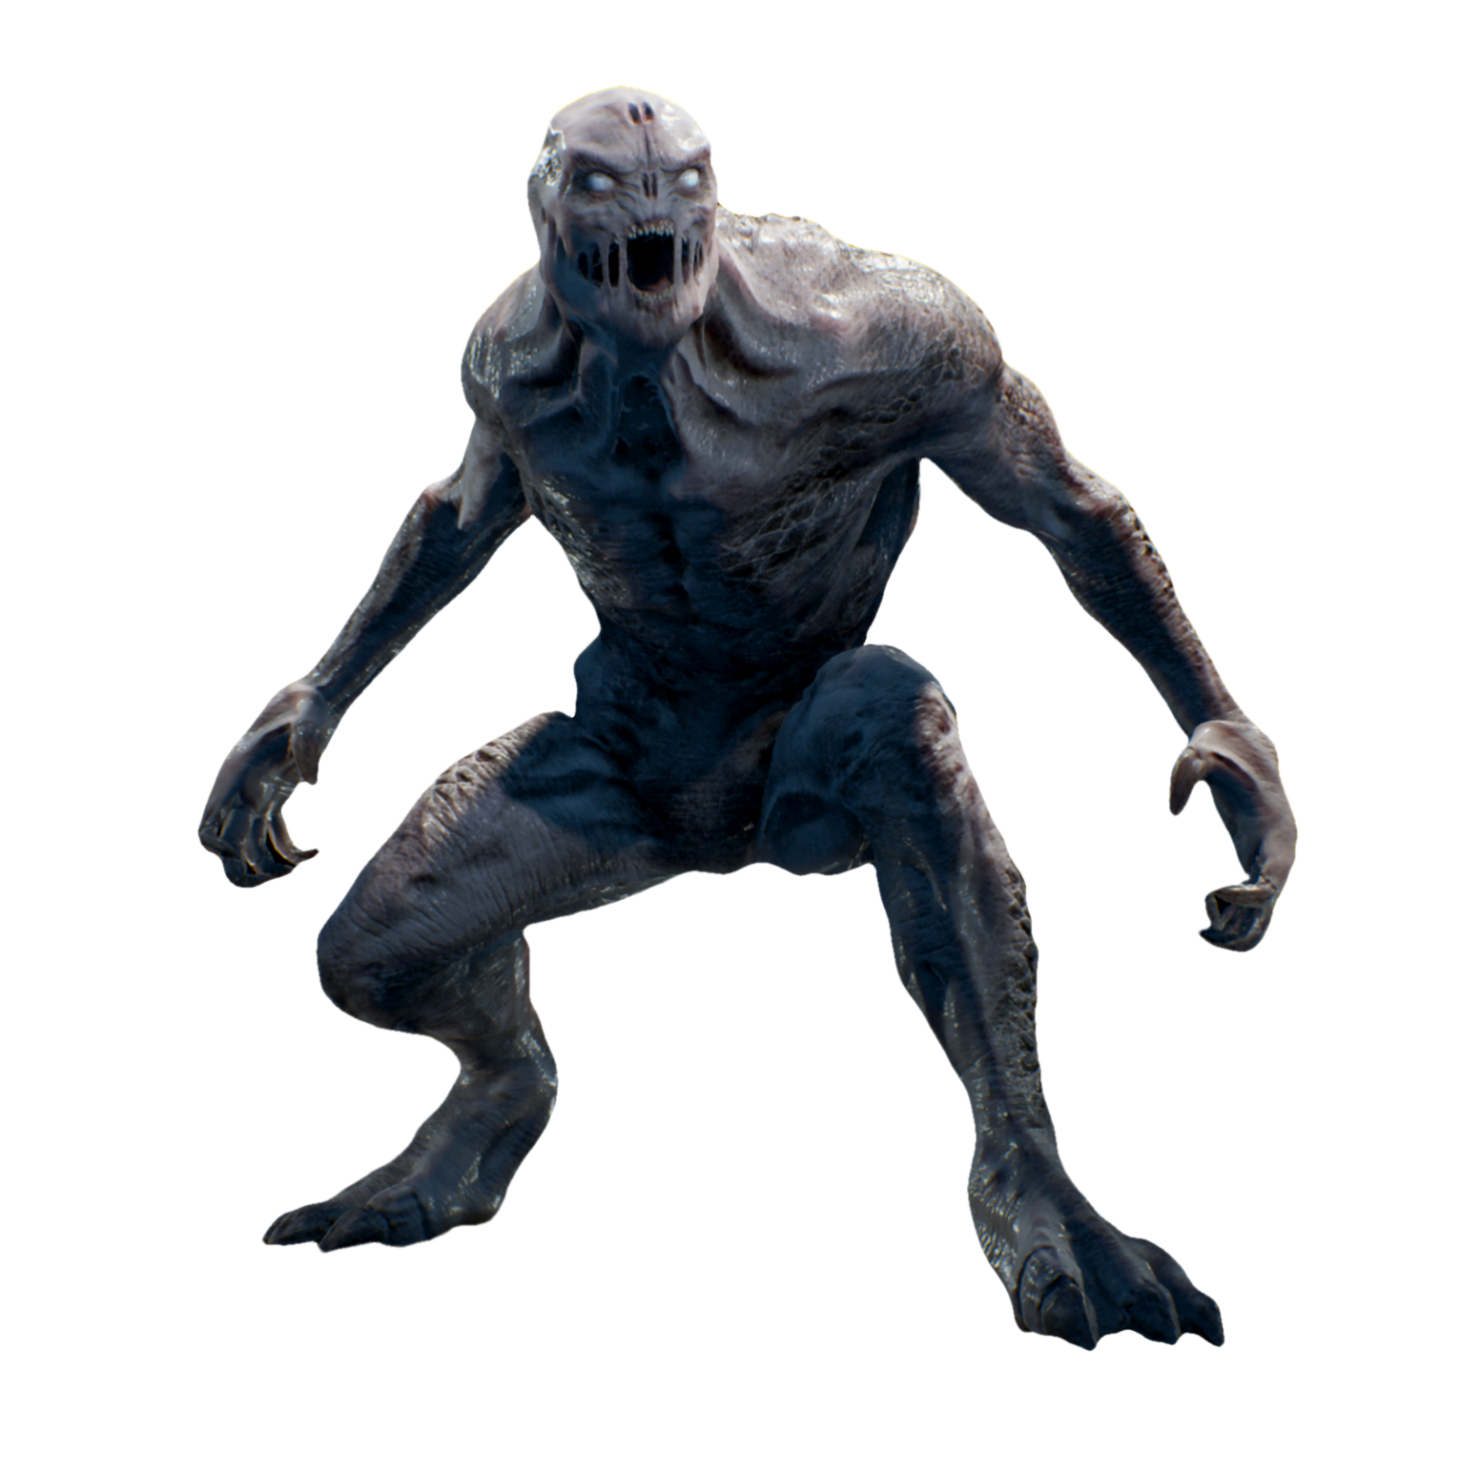 gears-of-war-4_character_juvie